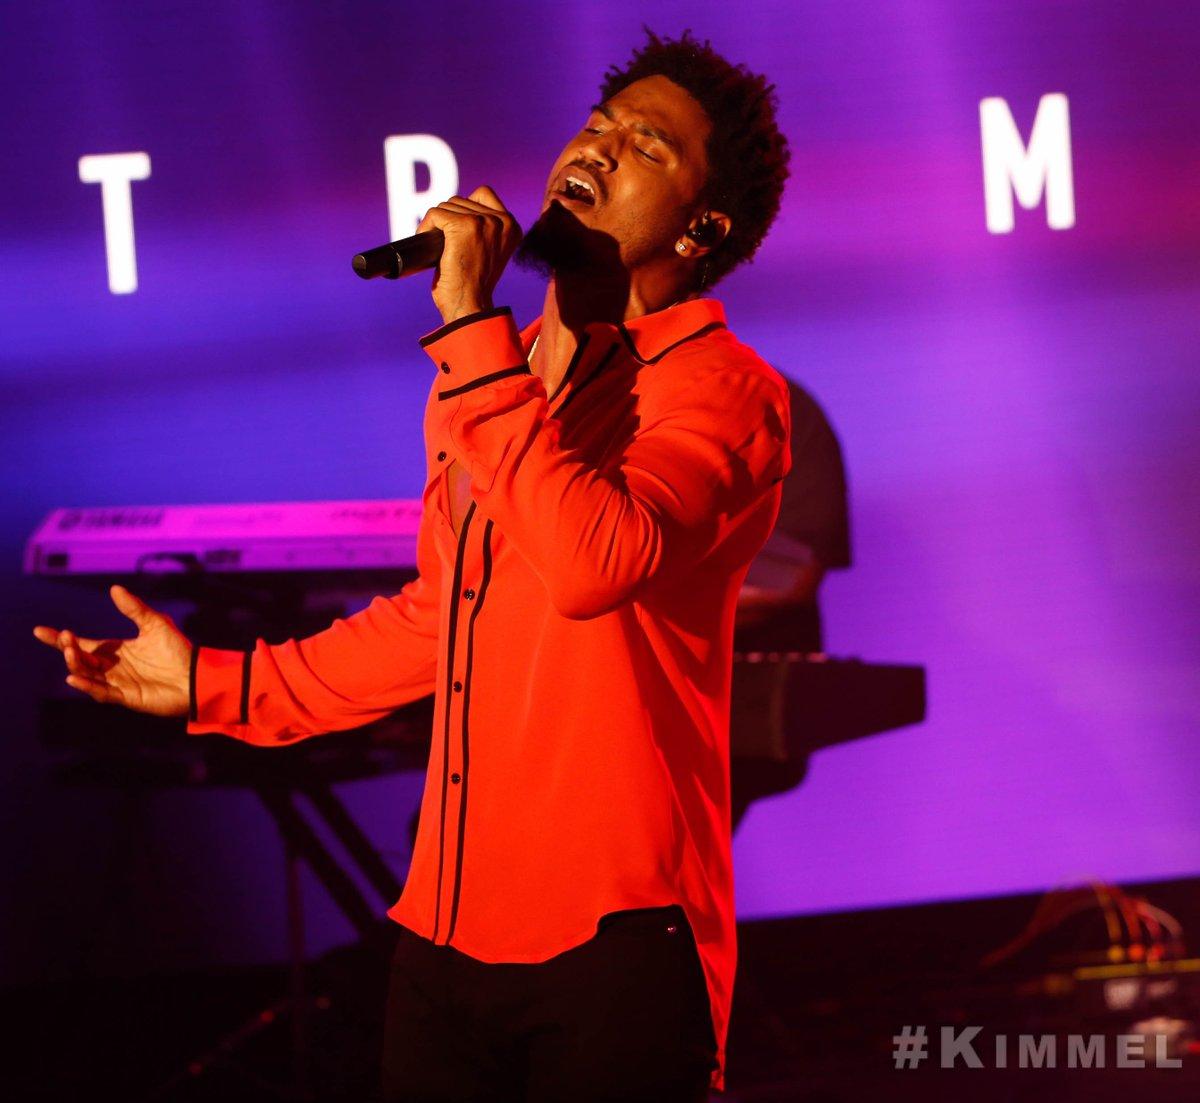 Trey Songz Jimmy Kimmel